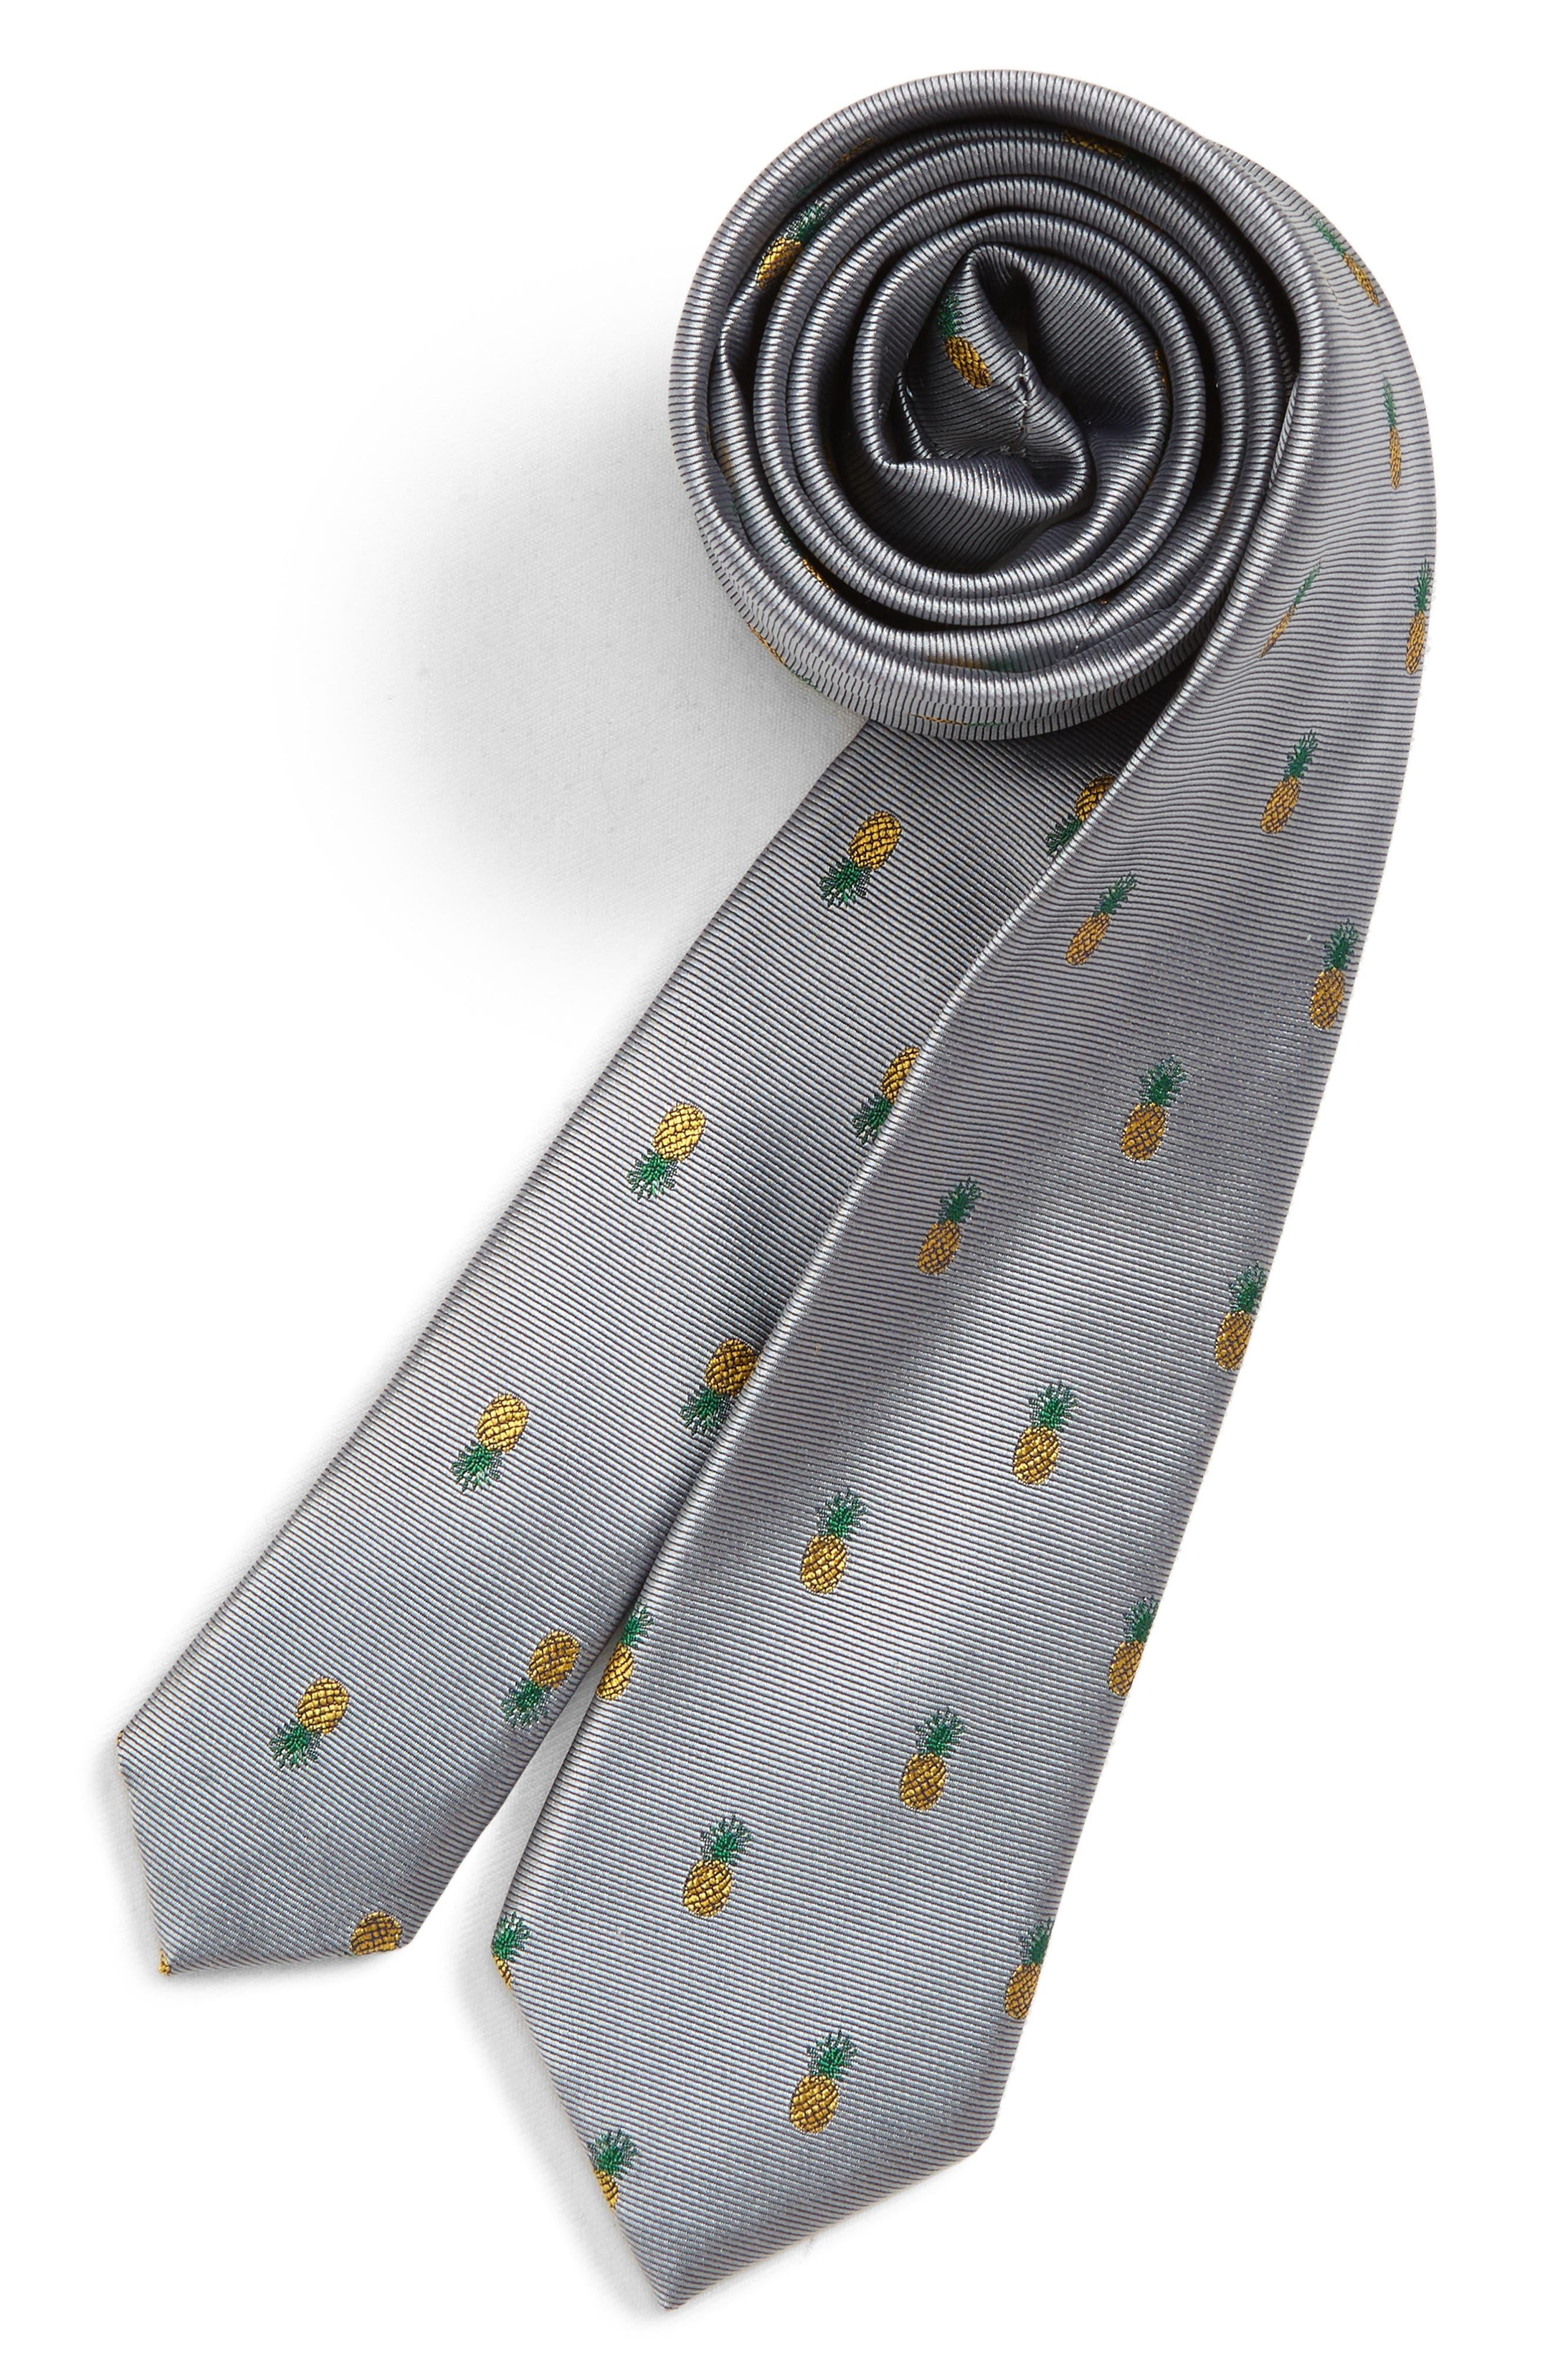 NORDSTROM, Pineapple Silk Tie, Main thumbnail 1, color, GREY